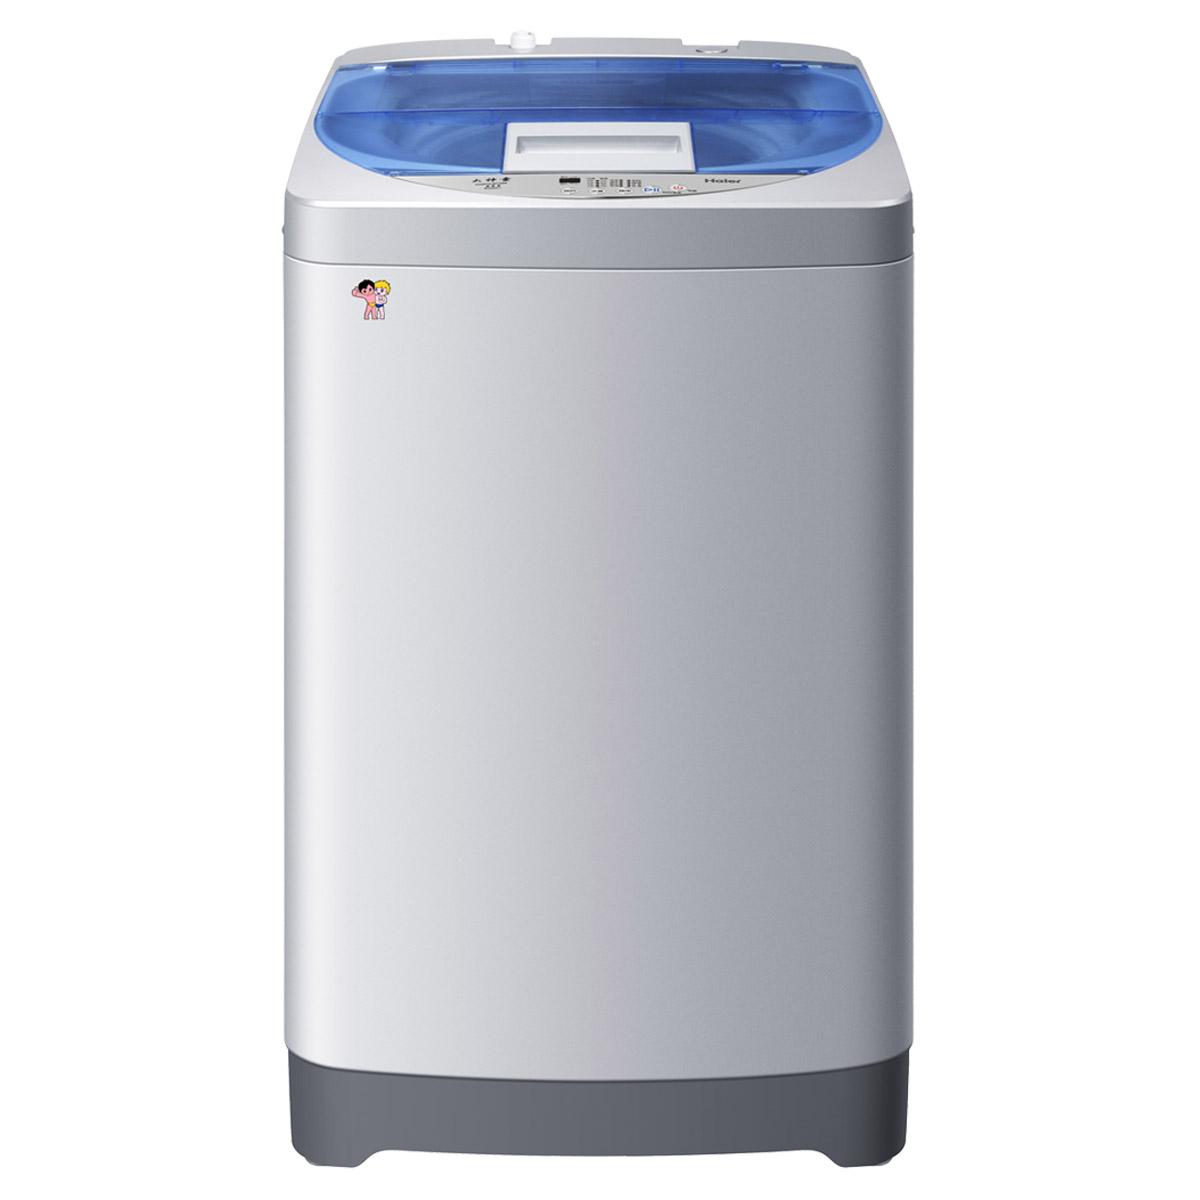 8e/xqb60-m1038 洗衣机